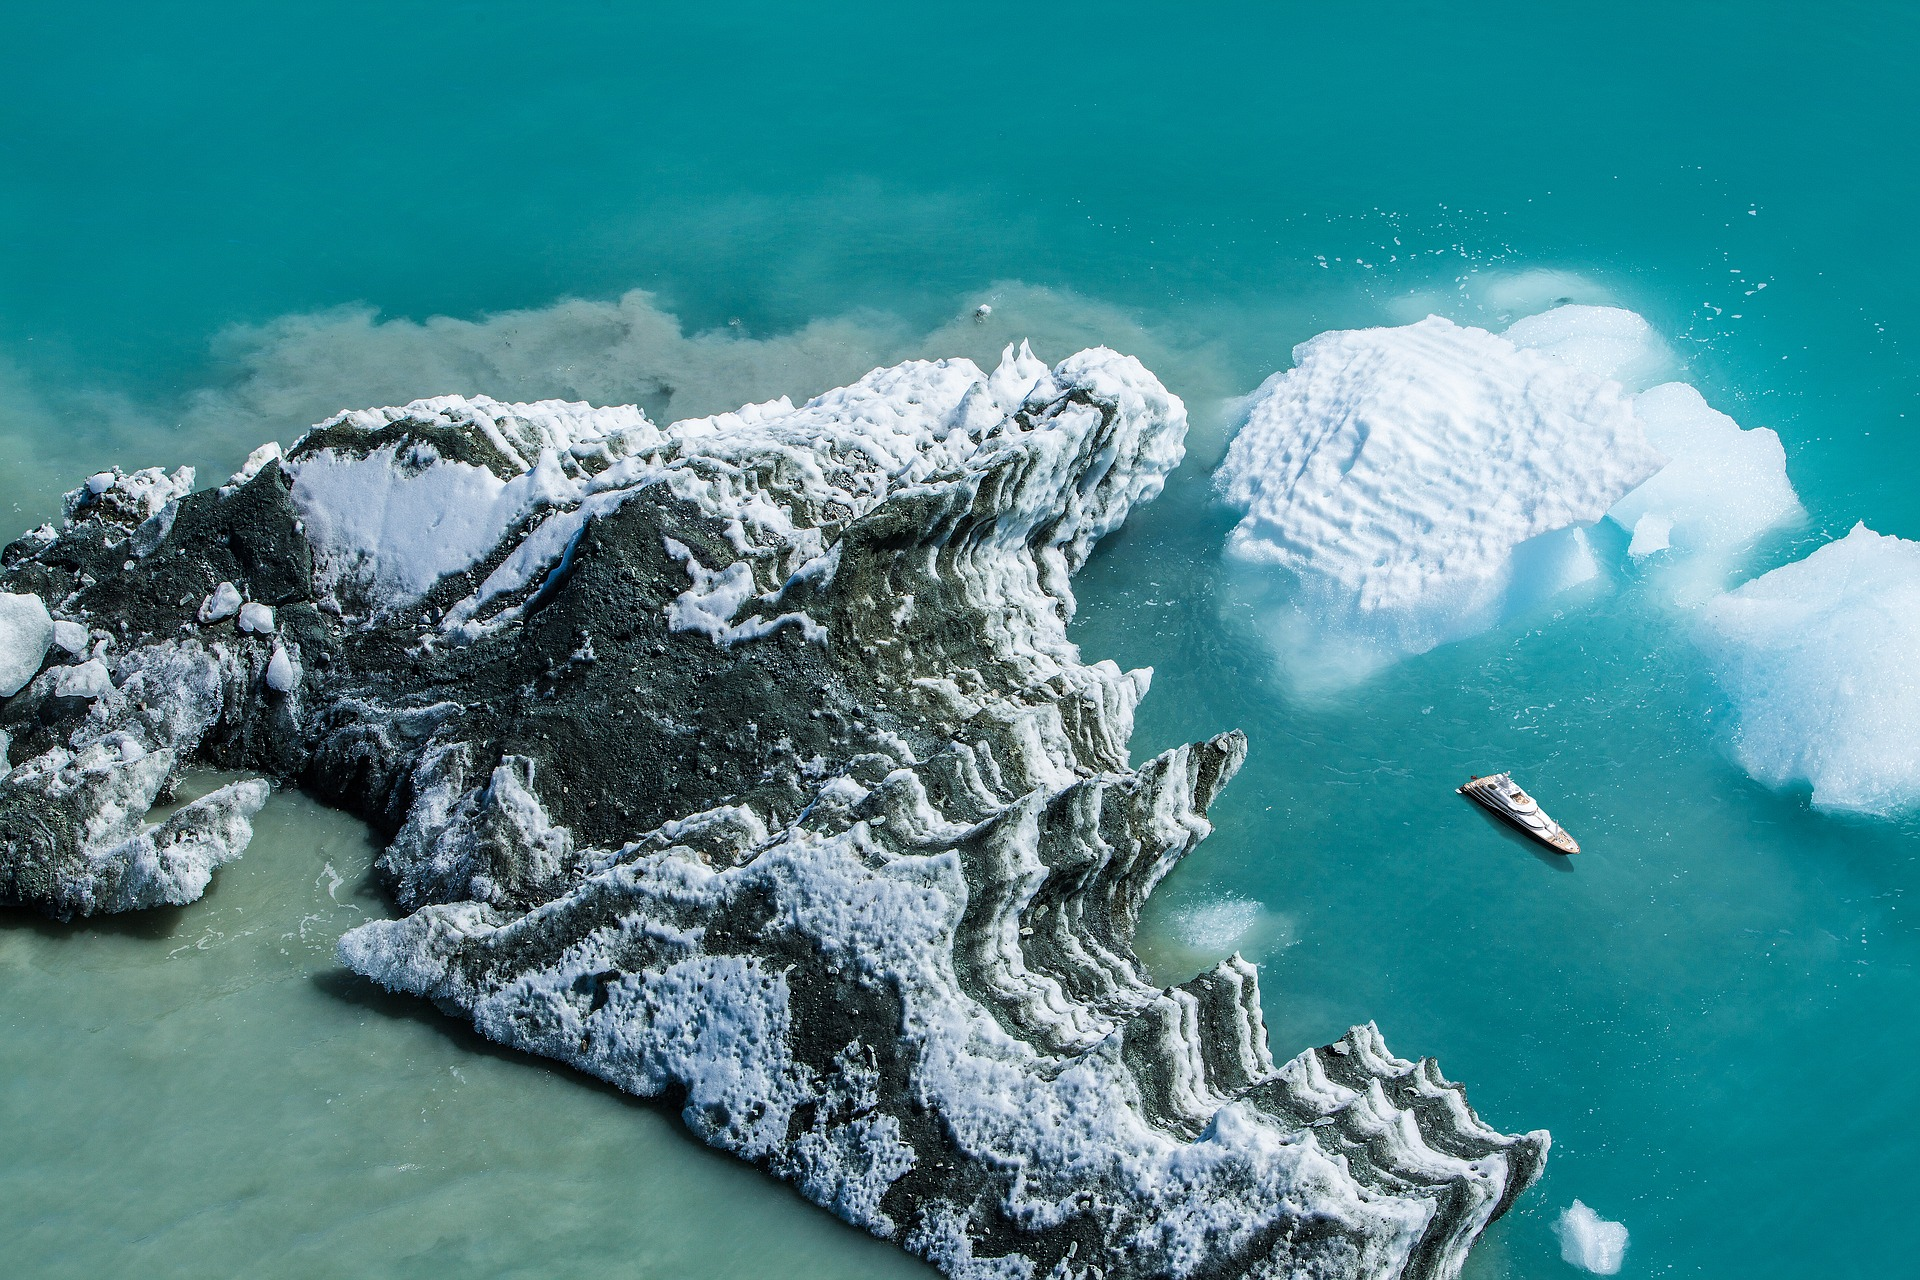 Antarctica Ocean Glacier Yacht tjb superyachts